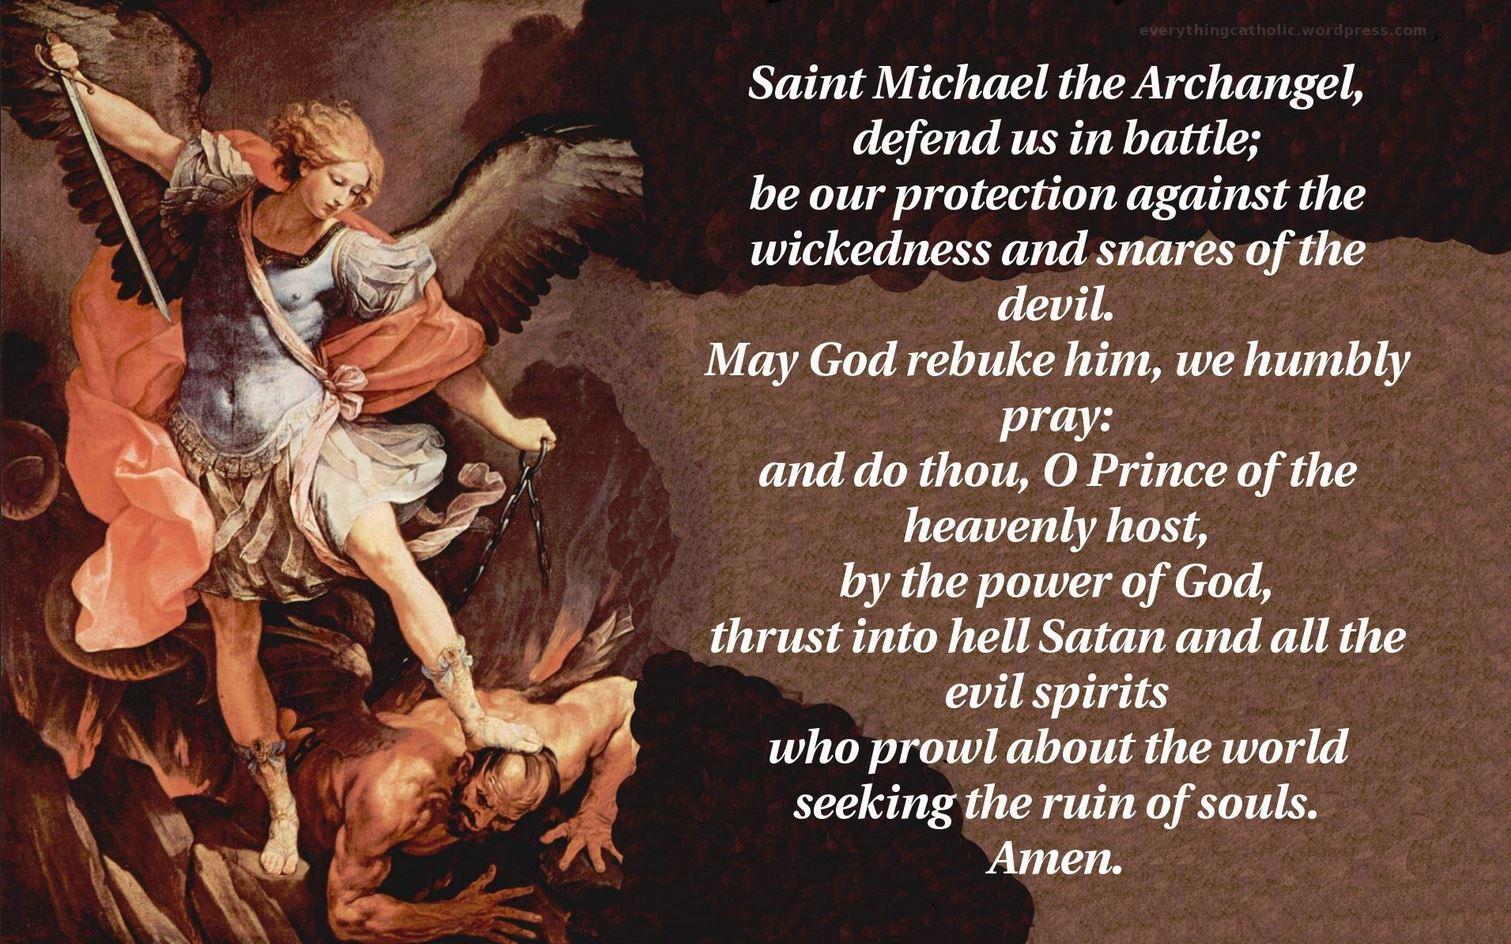 archangel michael wallpaper for computer - photo #32